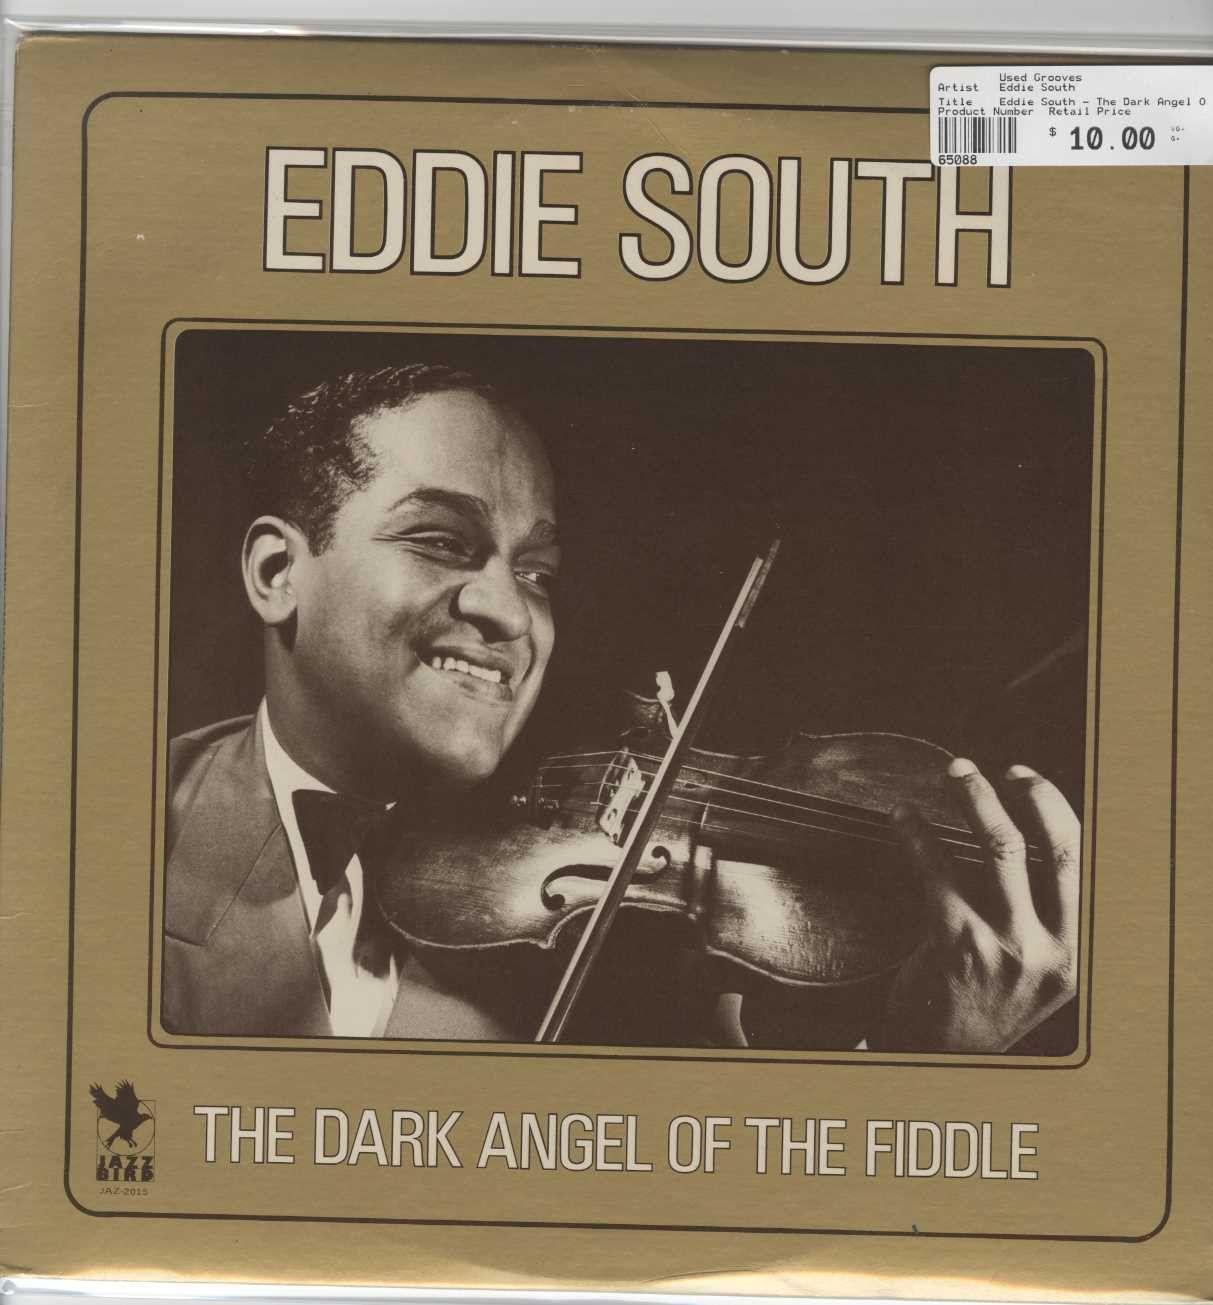 Eddie South - The Dark Angel Of The Fiddle